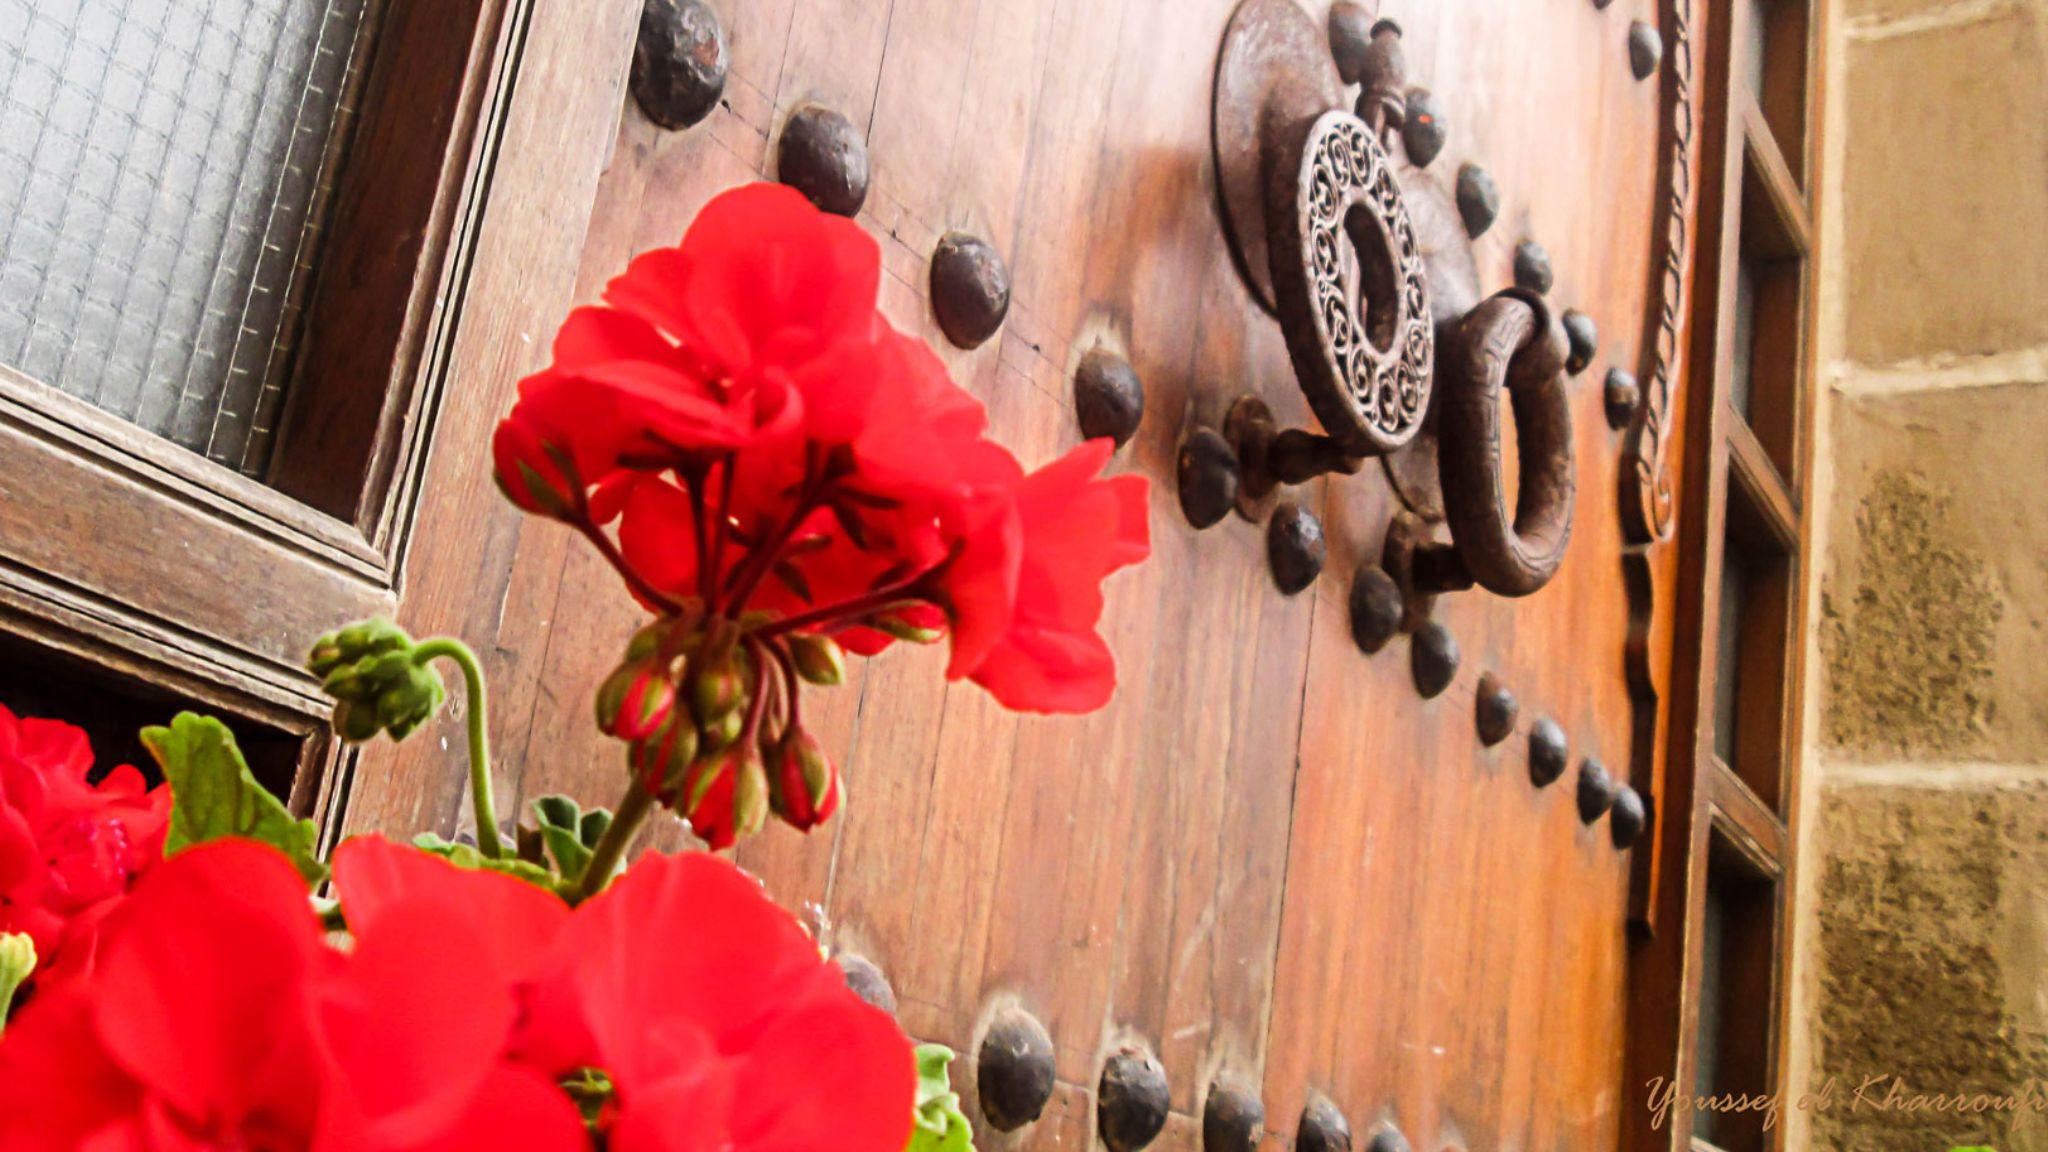 fleur et porte by Youssef Kharroufi